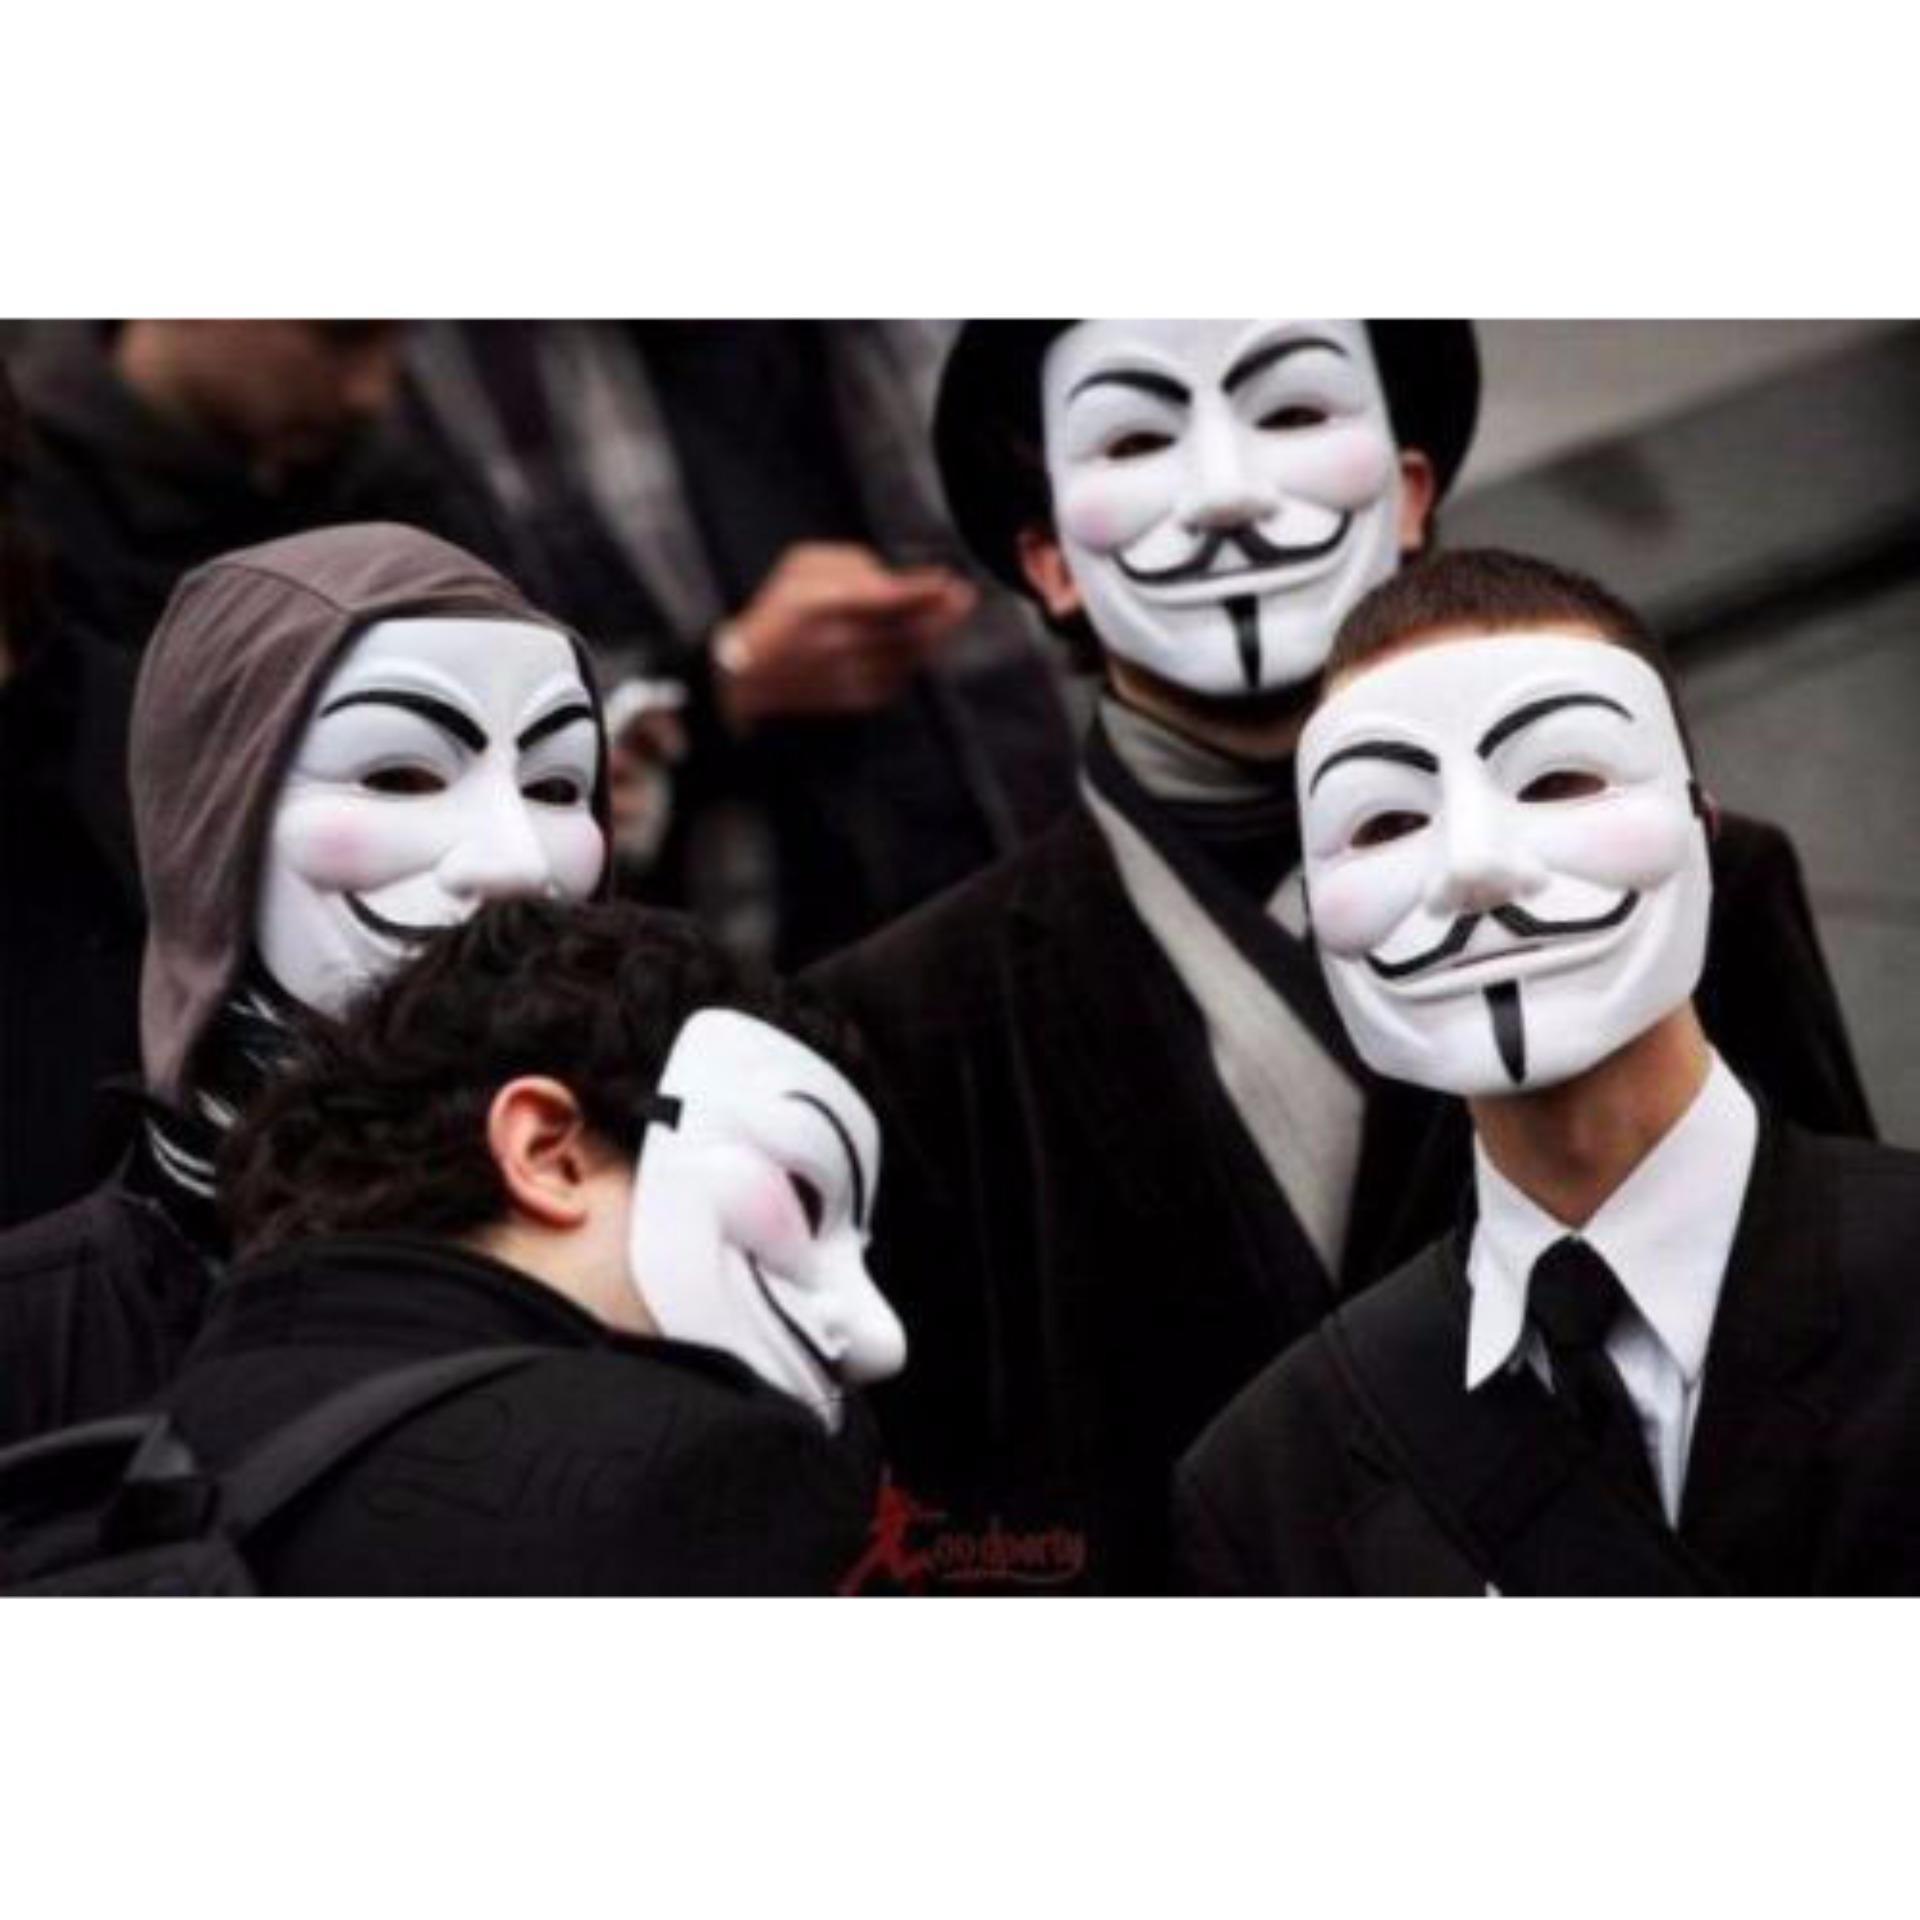 Skytop Topeng Vendetta Mask Occupy Anonymous Cosplay Putih Daftar Source · Lucky Topeng Vendetta Topeng Plastik Tahan Lama Topeng Halloween pesta kostum ...